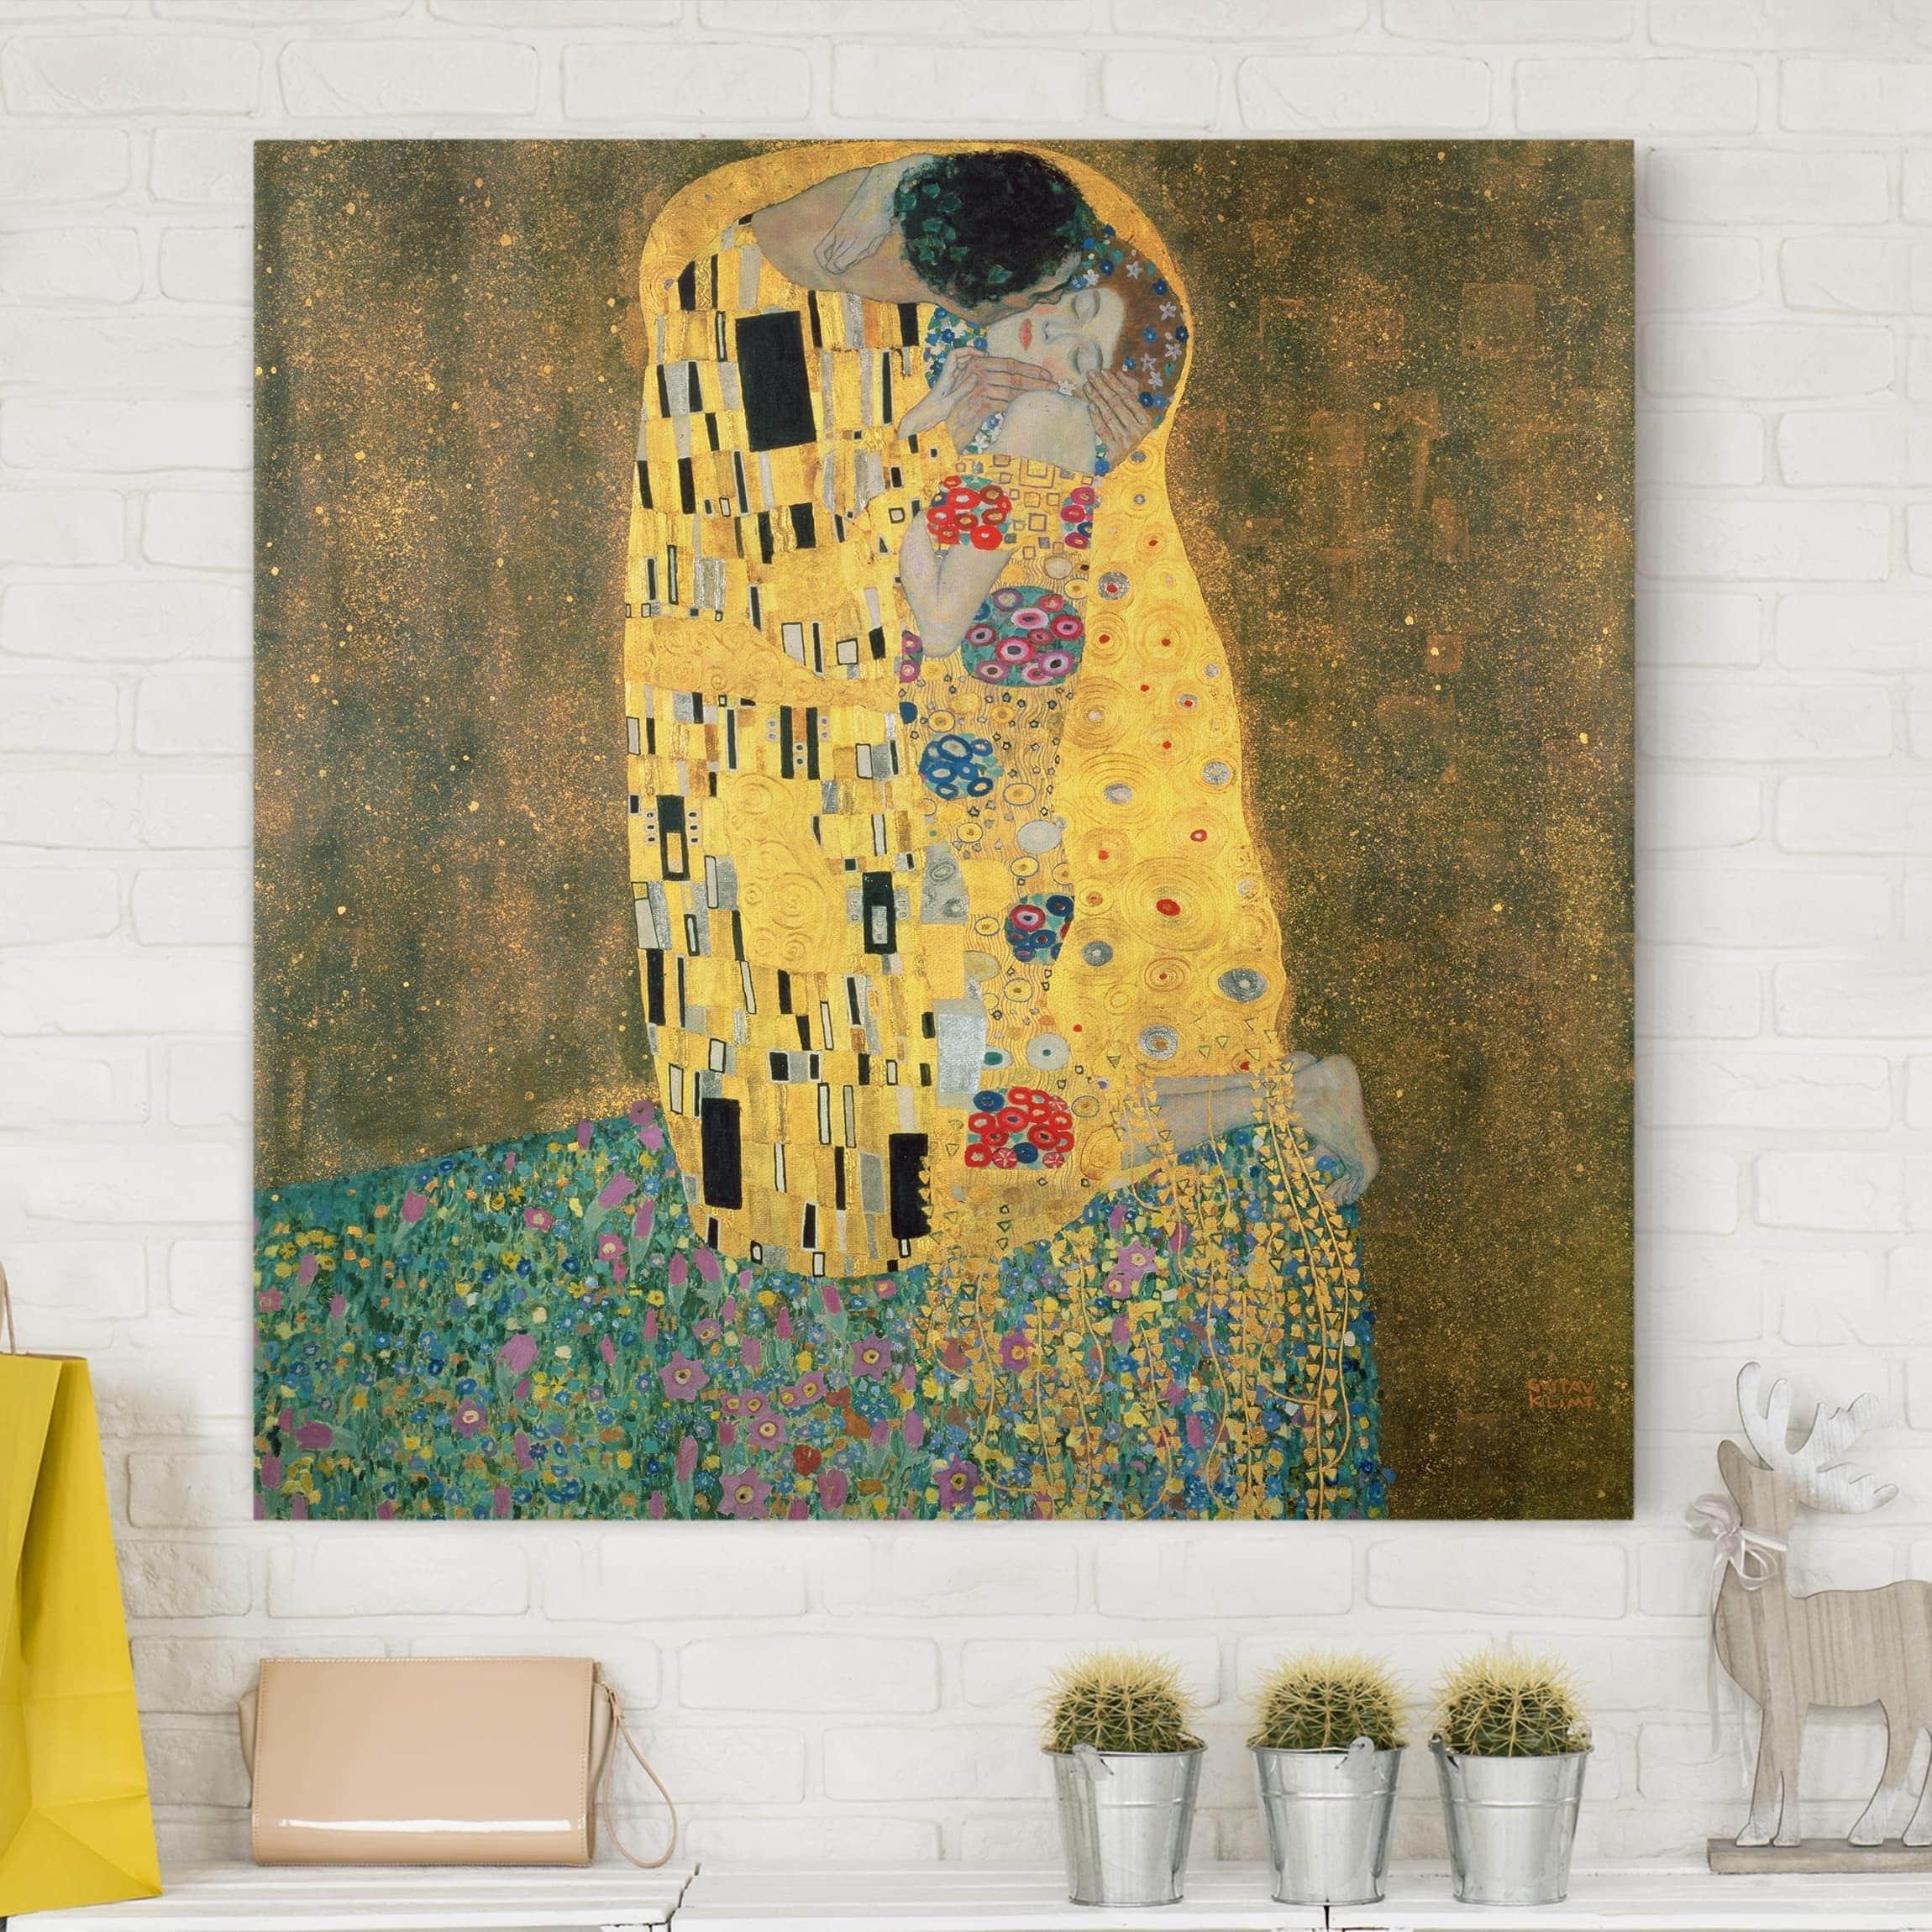 Leinwandbild - Gustav Klimt Der Kuss | Wandbilder Wanddeko Kunst Kunstdruck Künstler Malerei Jugendstil Wanddekoration